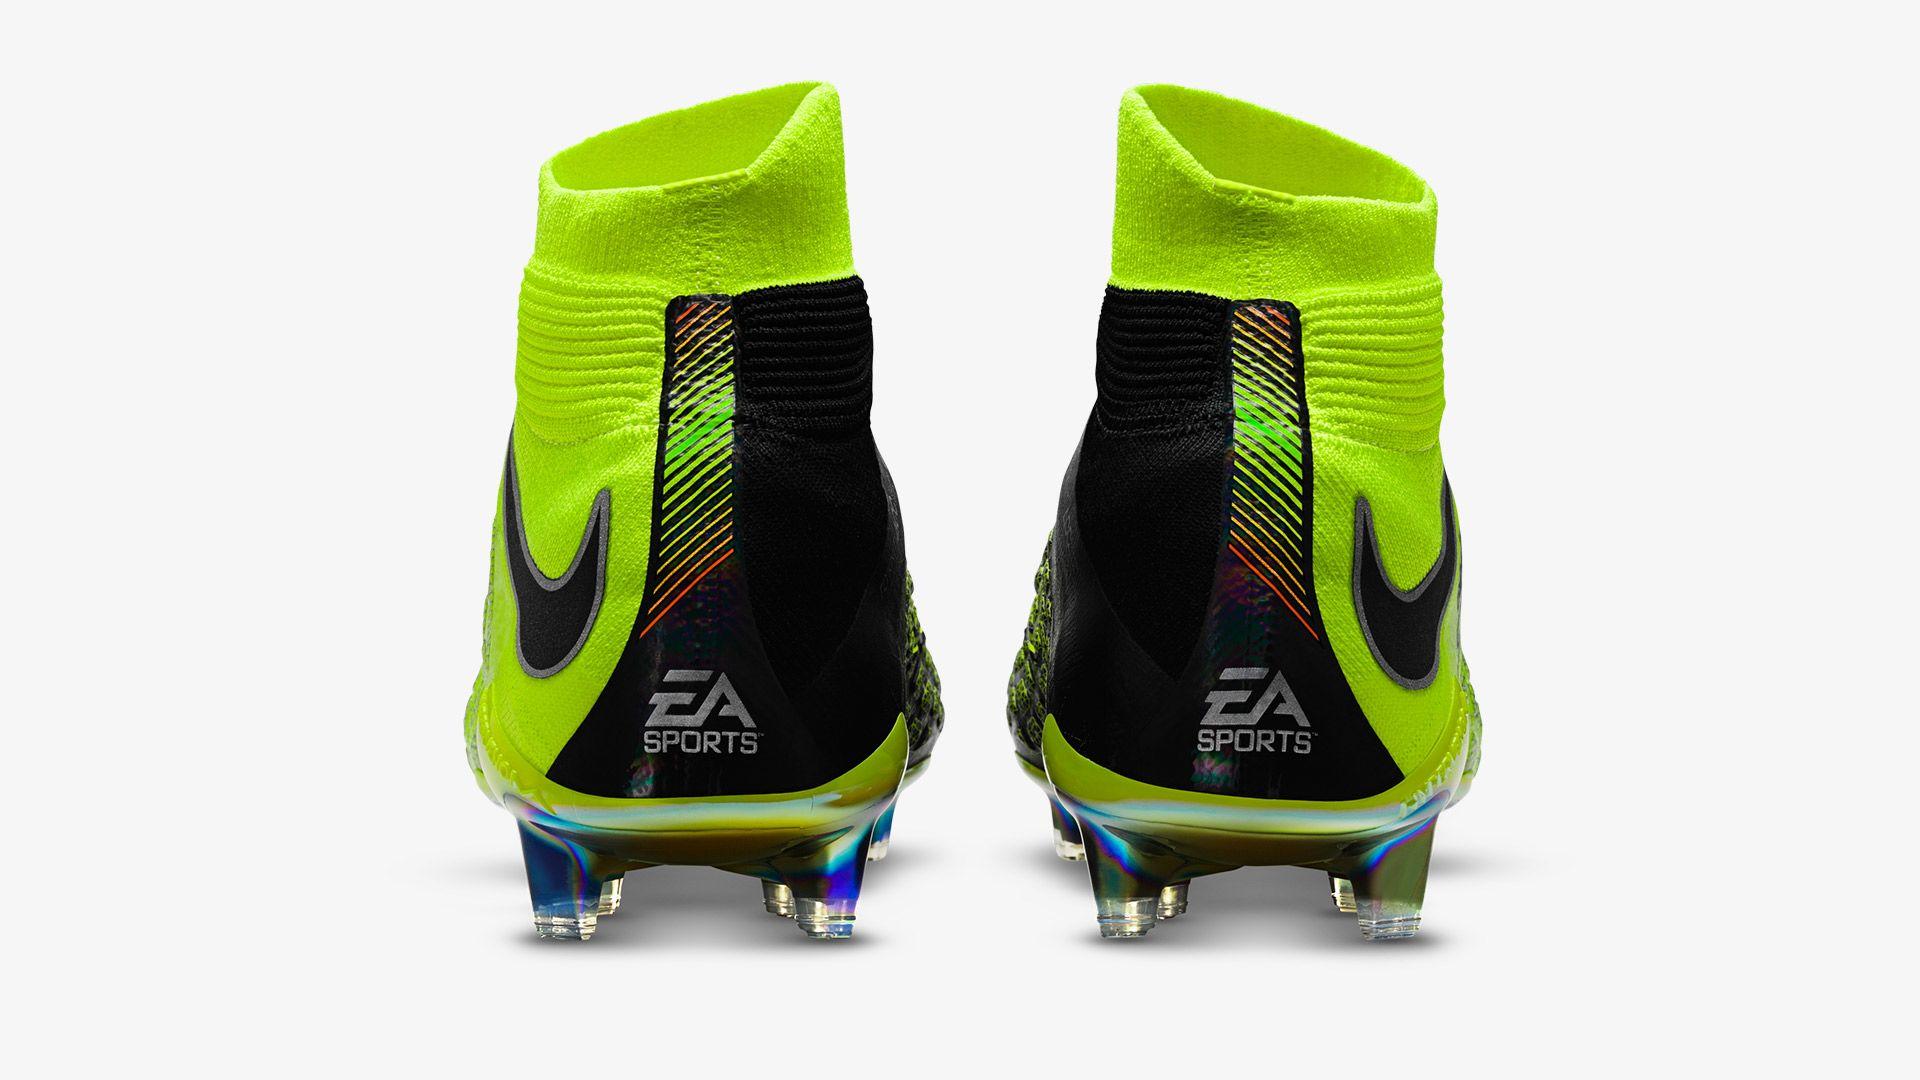 new product fedc0 e4649 Nike Hypervenom Phantom III DF FG 'EA SPORTS'. Nike.com